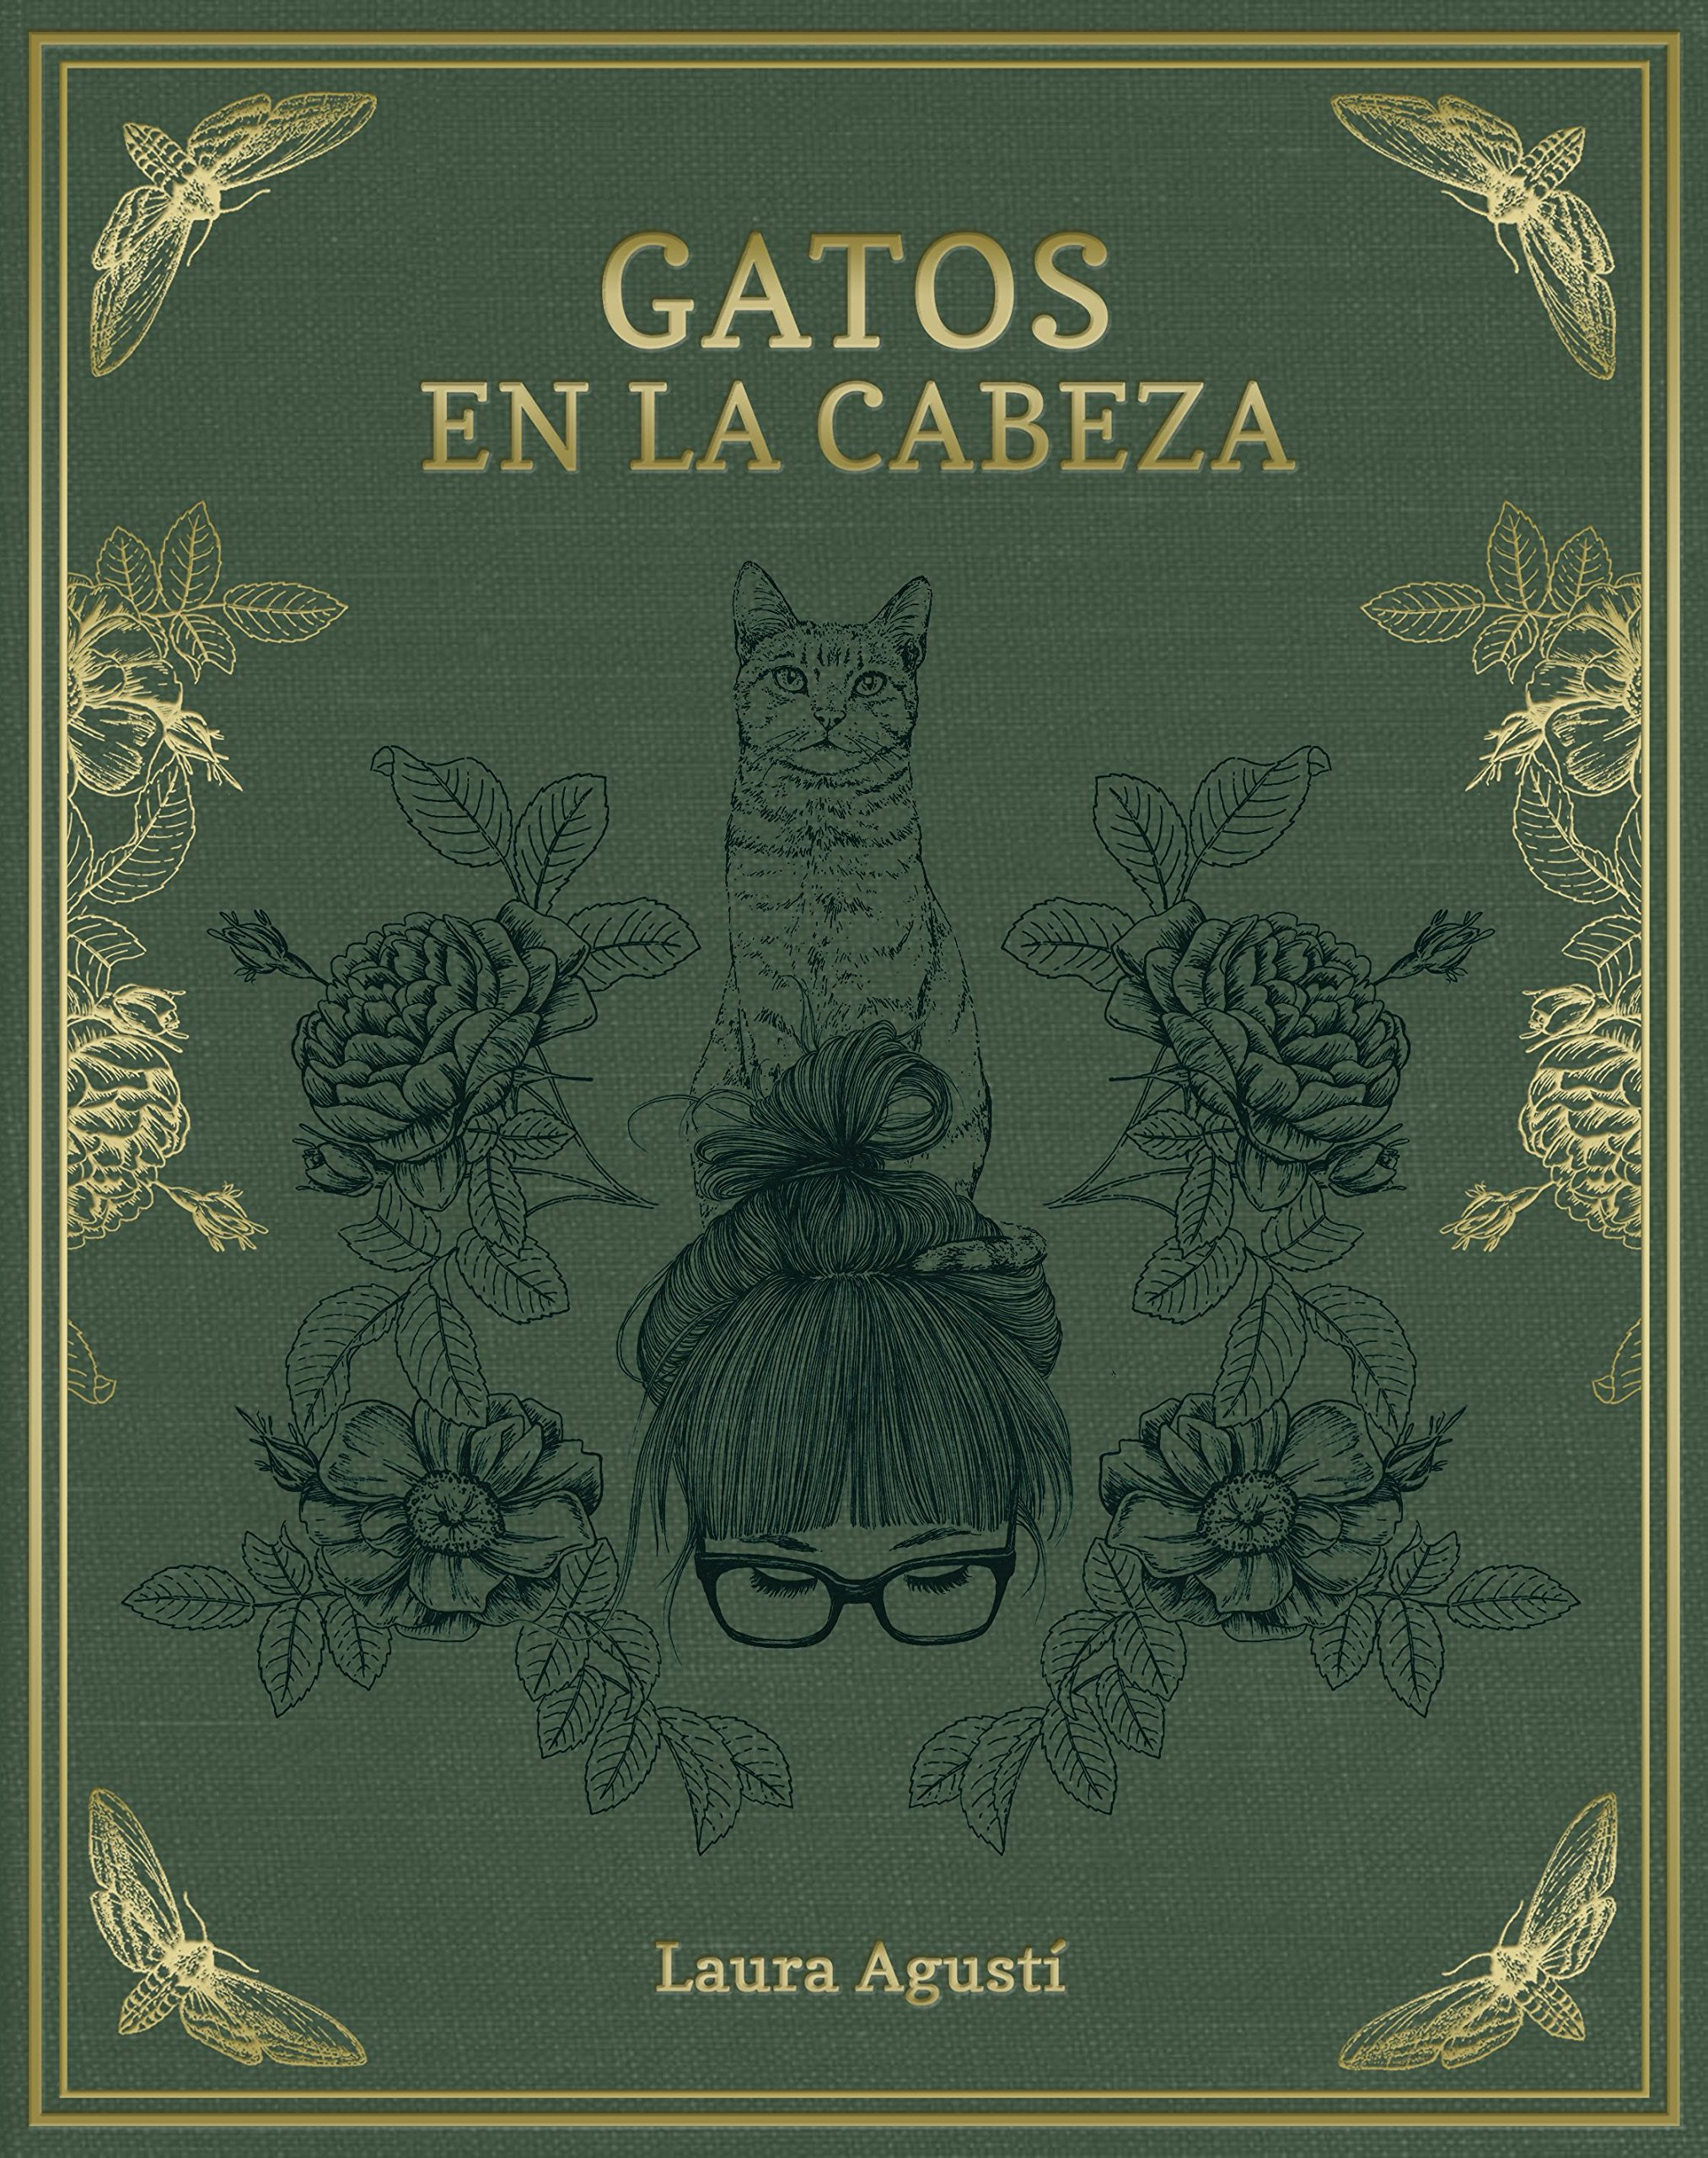 Gatos en la cabeza (Spanish) Hardcover – May 1, 2018